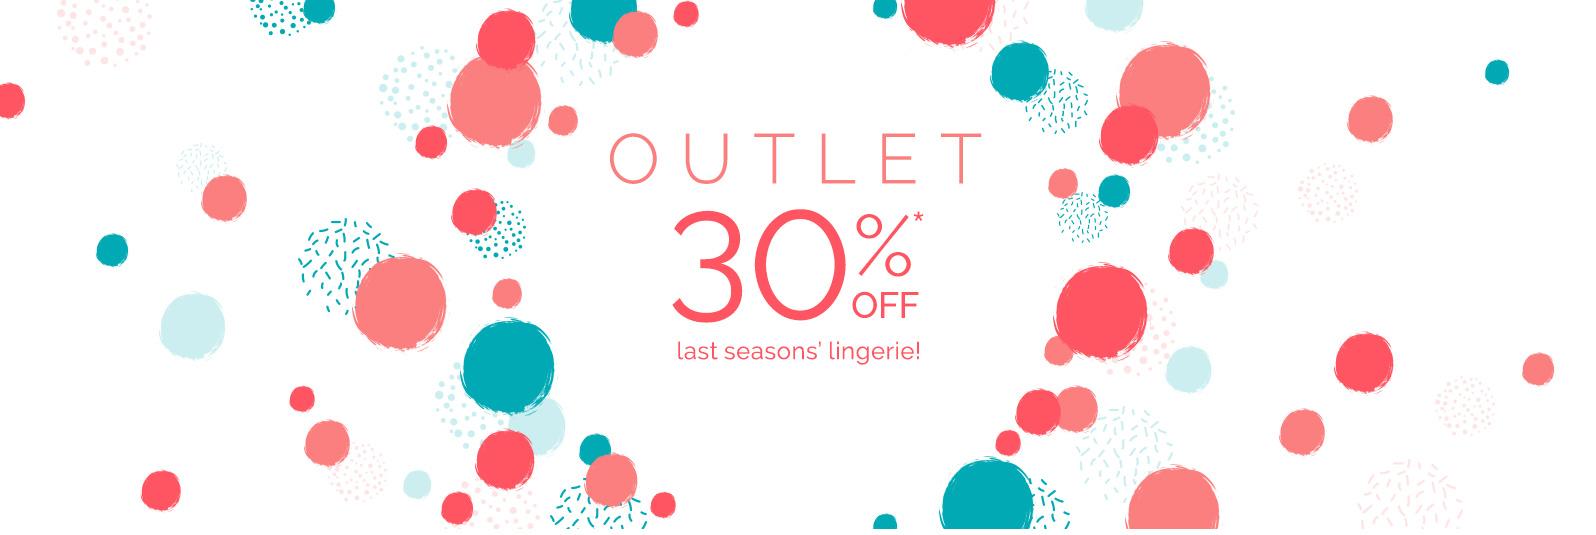 Outlet - 30%off* Last seasons' lingerie